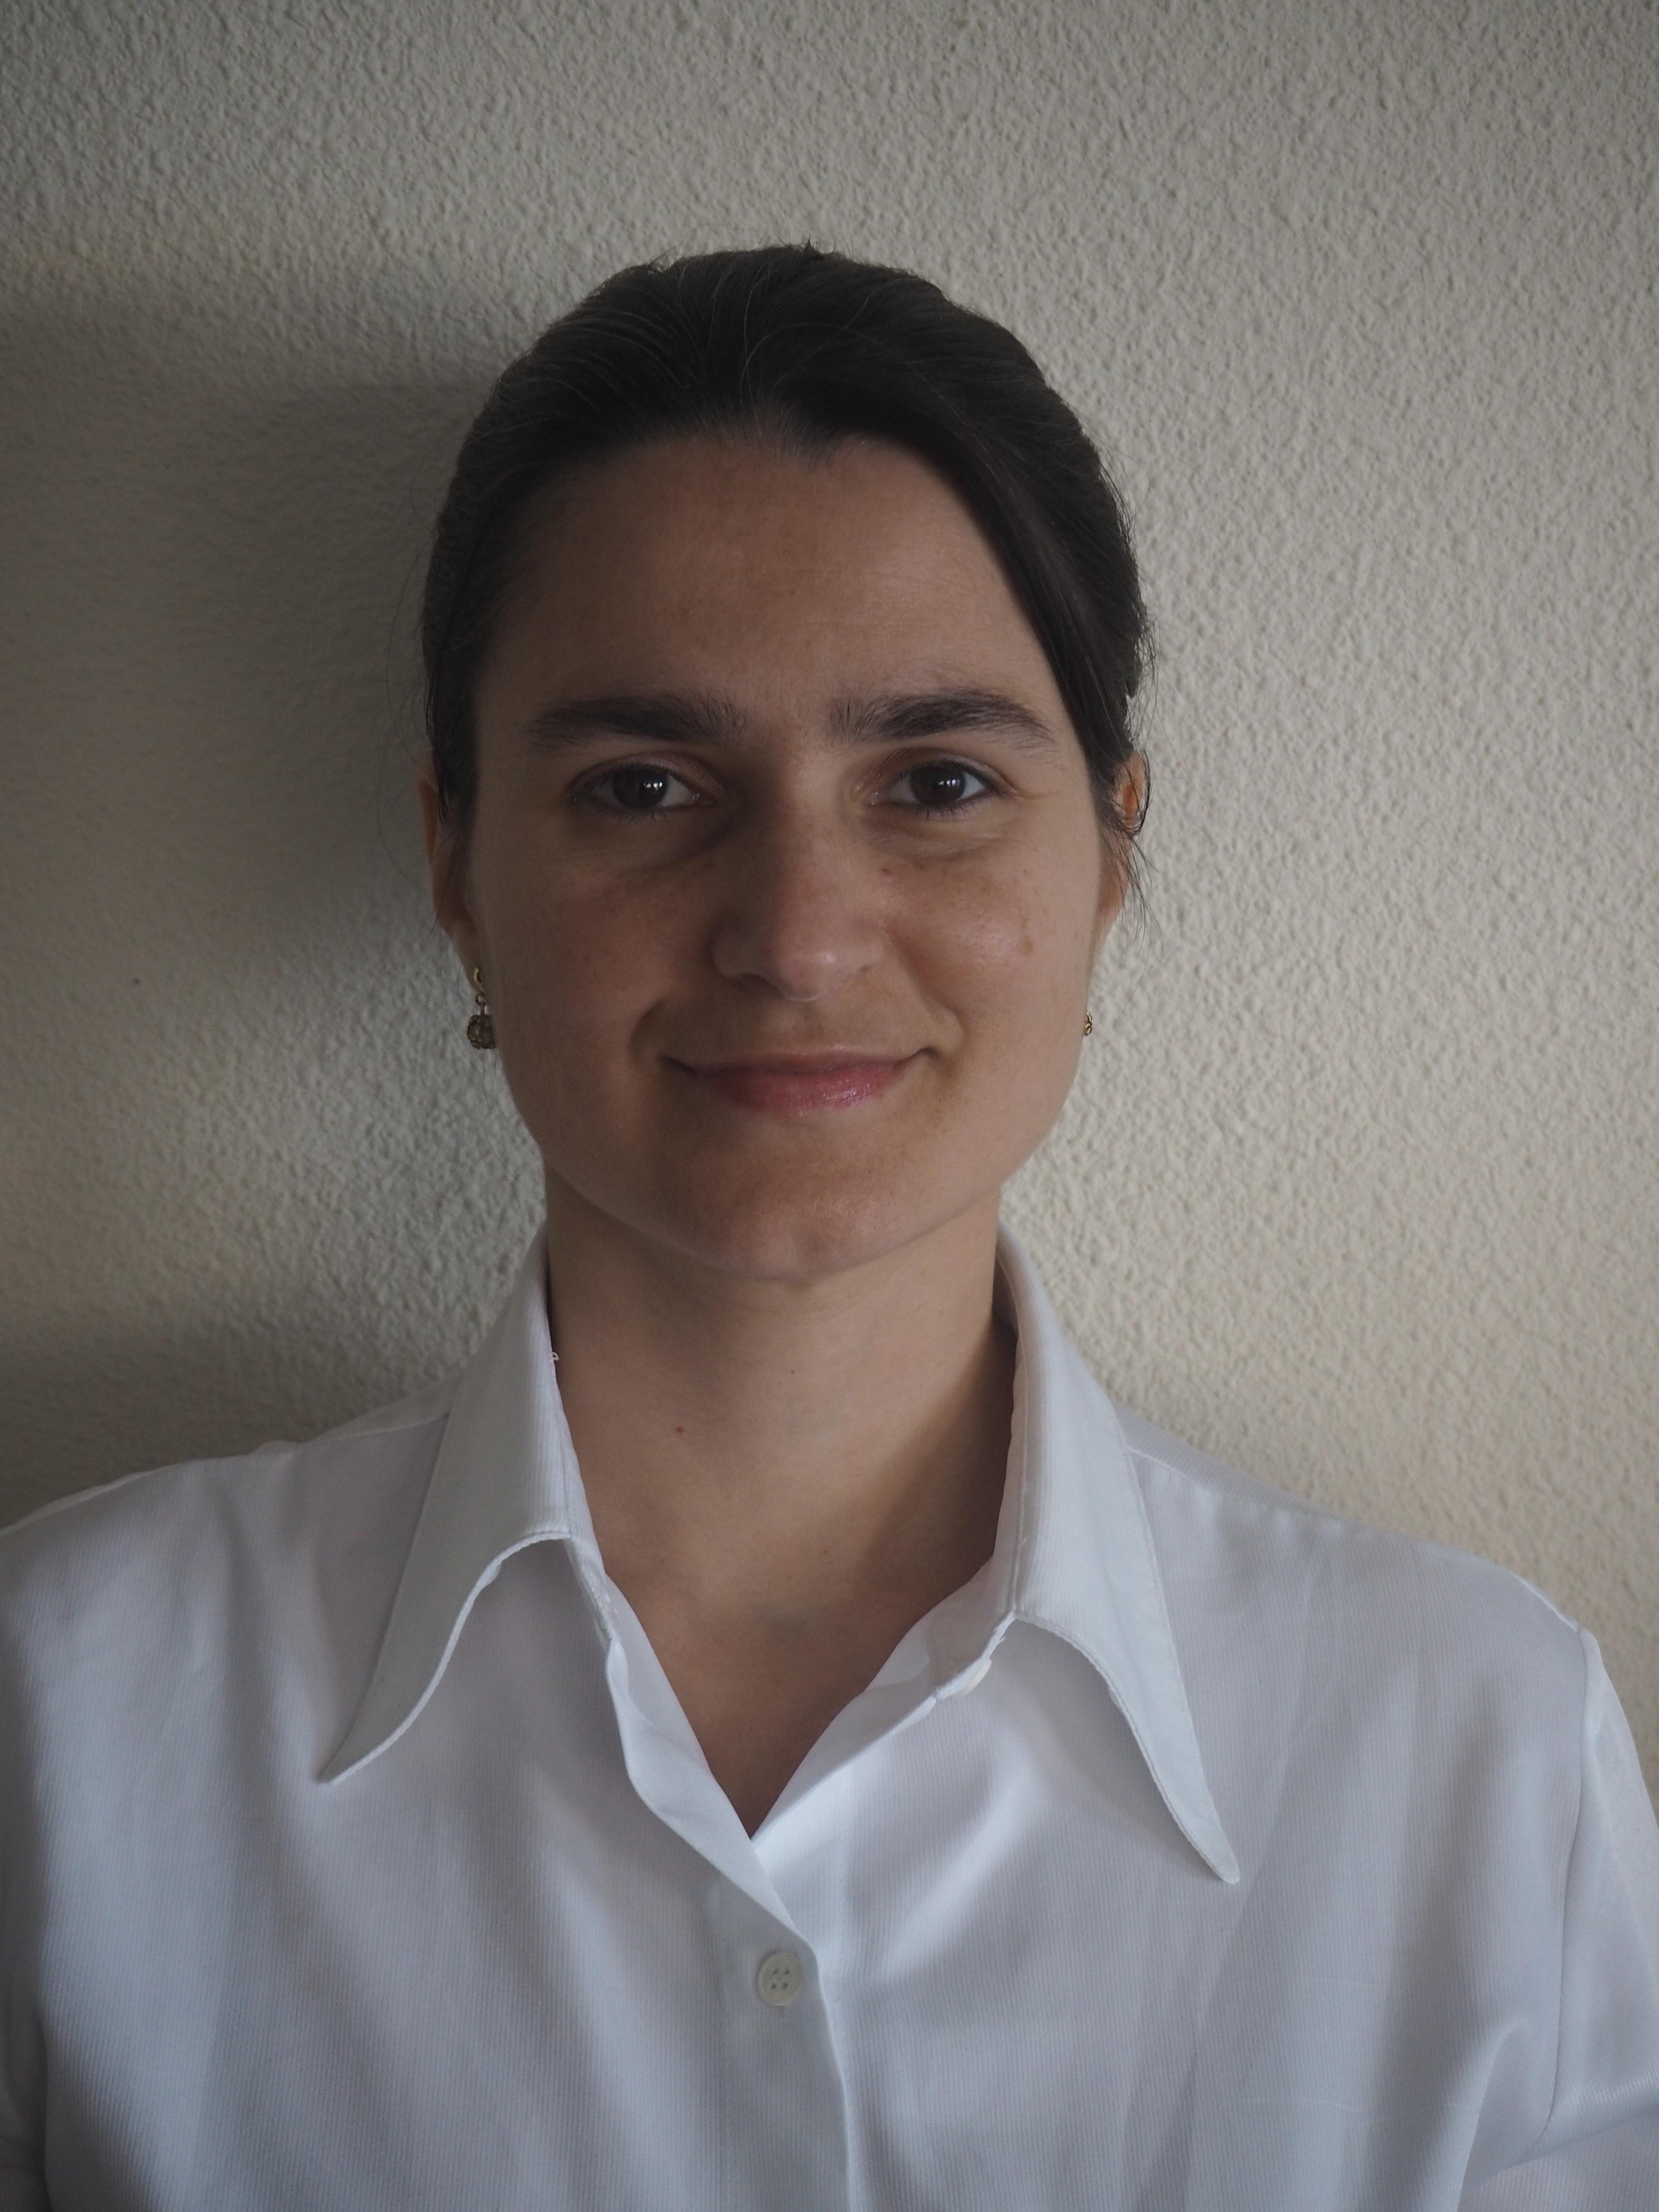 Fernanda Martin Catarucci